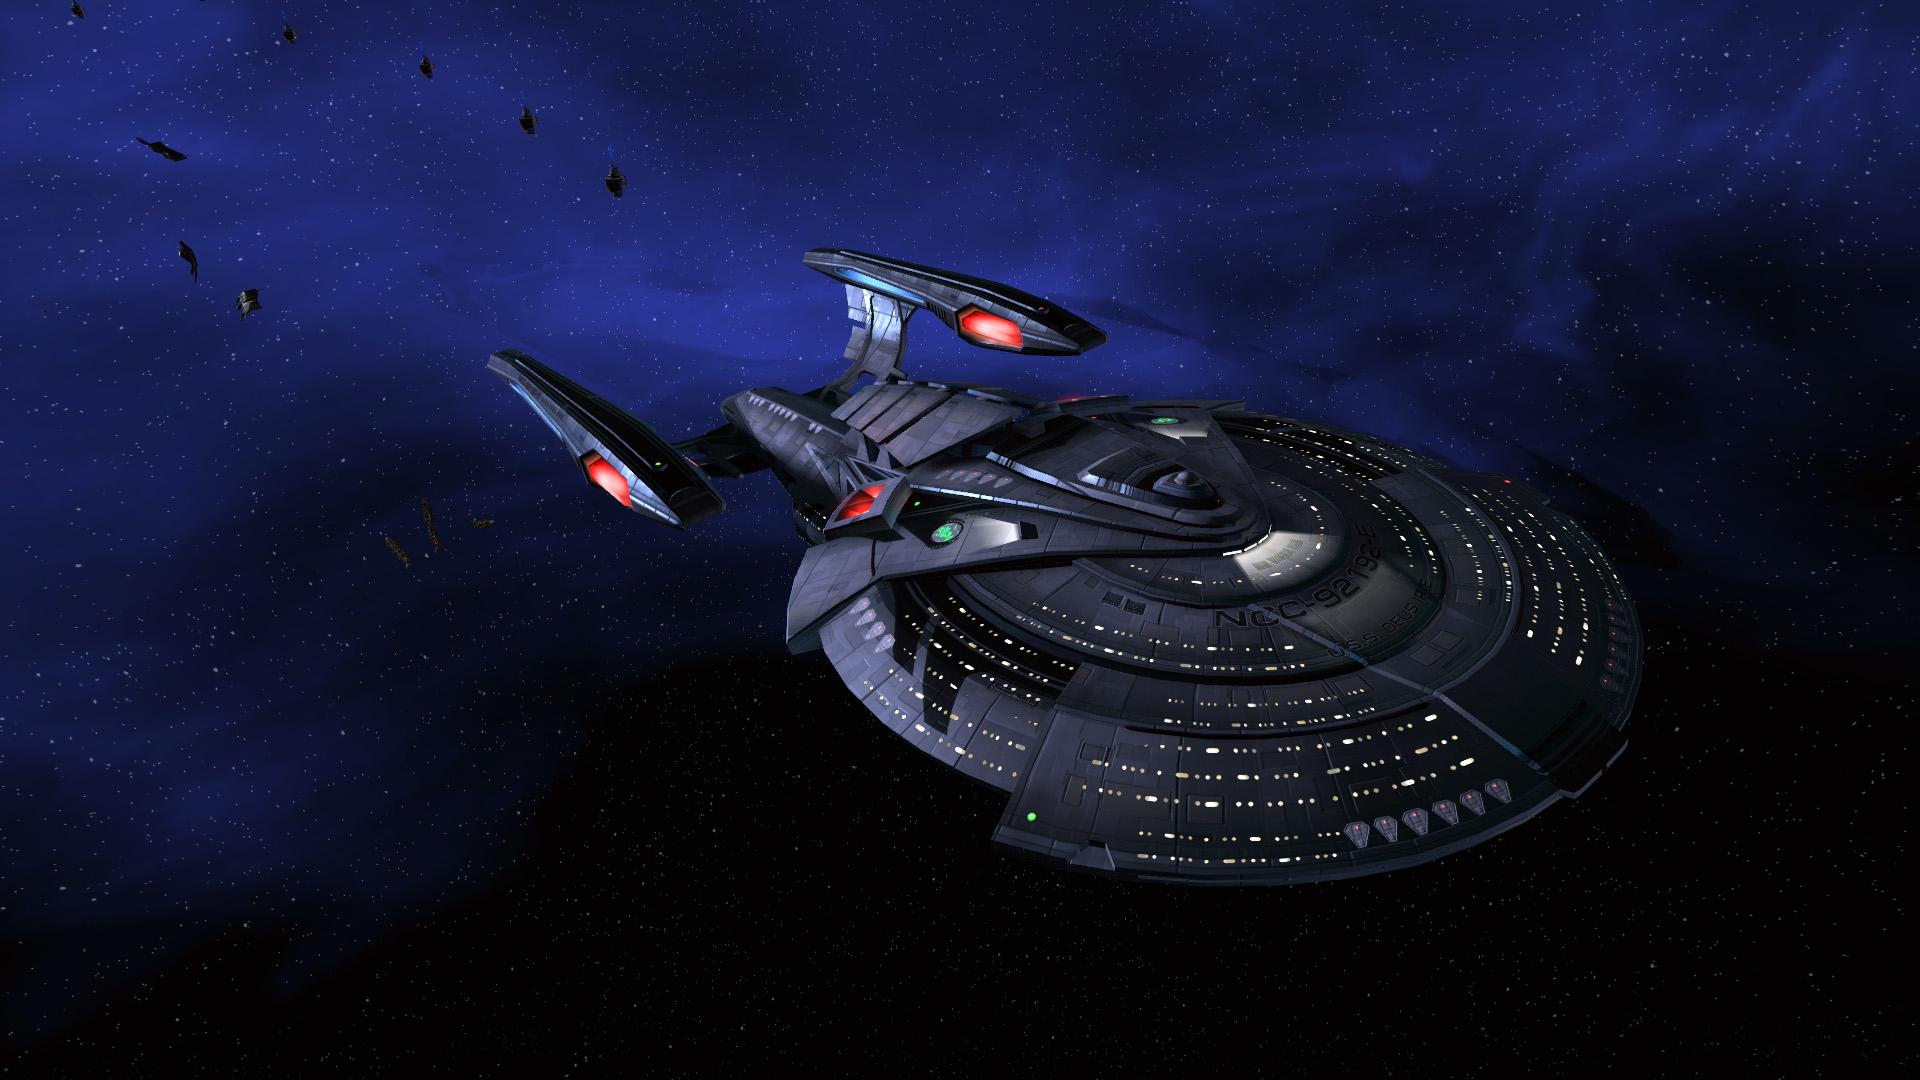 Star trek voyager spacecraft - Star Trek 1920 1080 Widescreen Wallpapers Tos Tng Ds9 Voyager